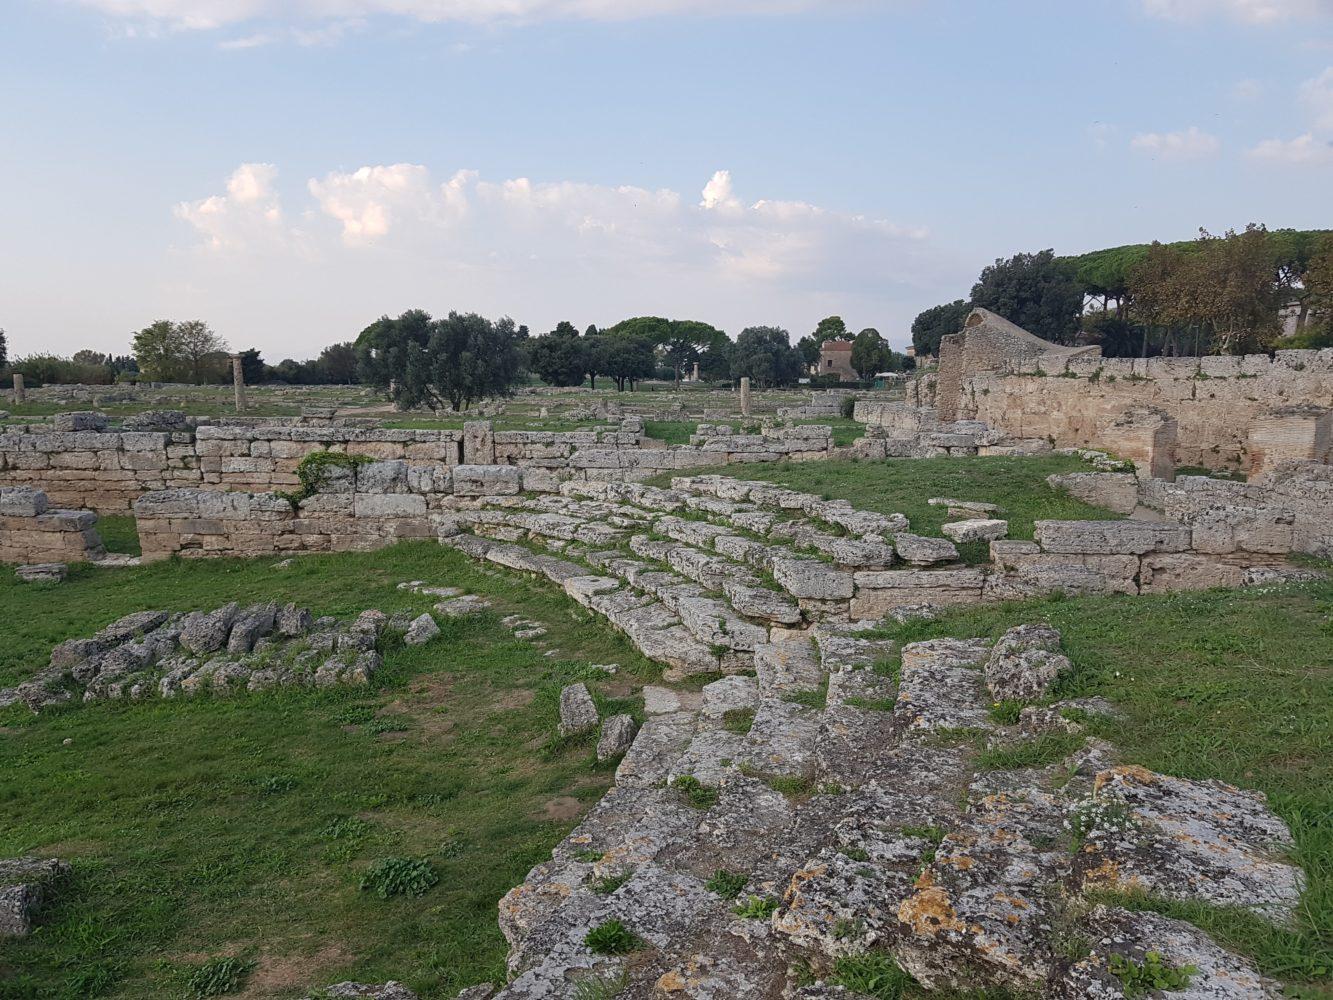 Comitium o comizio di PaestumScavi di Paestum, parco archeologico di paestum experience Il Comitium